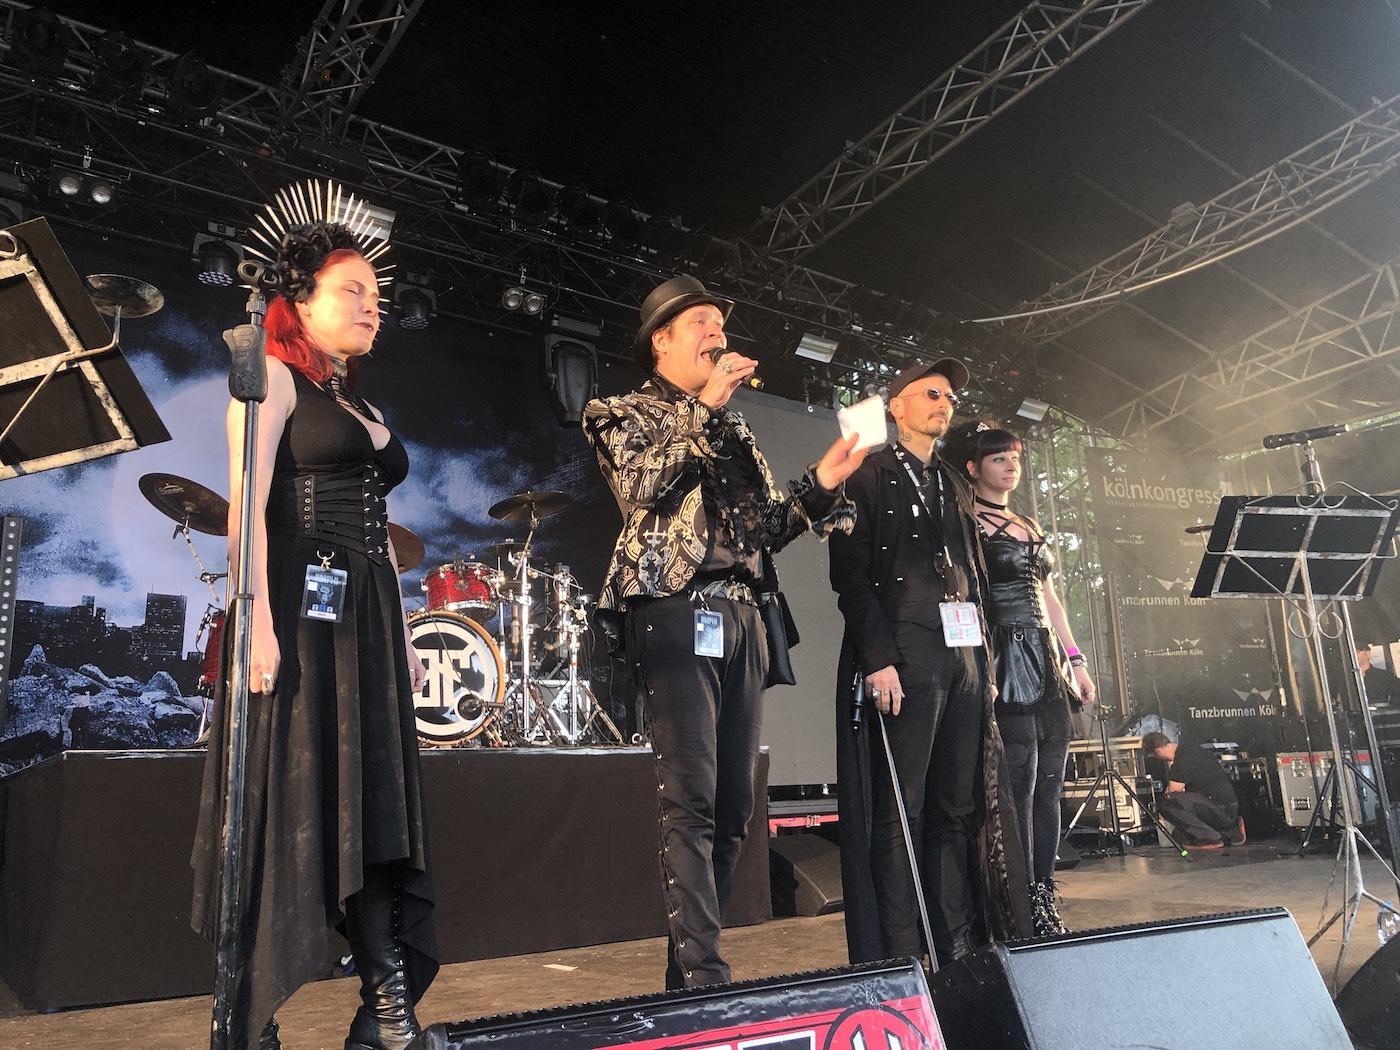 mark_benecke_amphi_festival_koeln_2019 - 221.jpg .jpeg